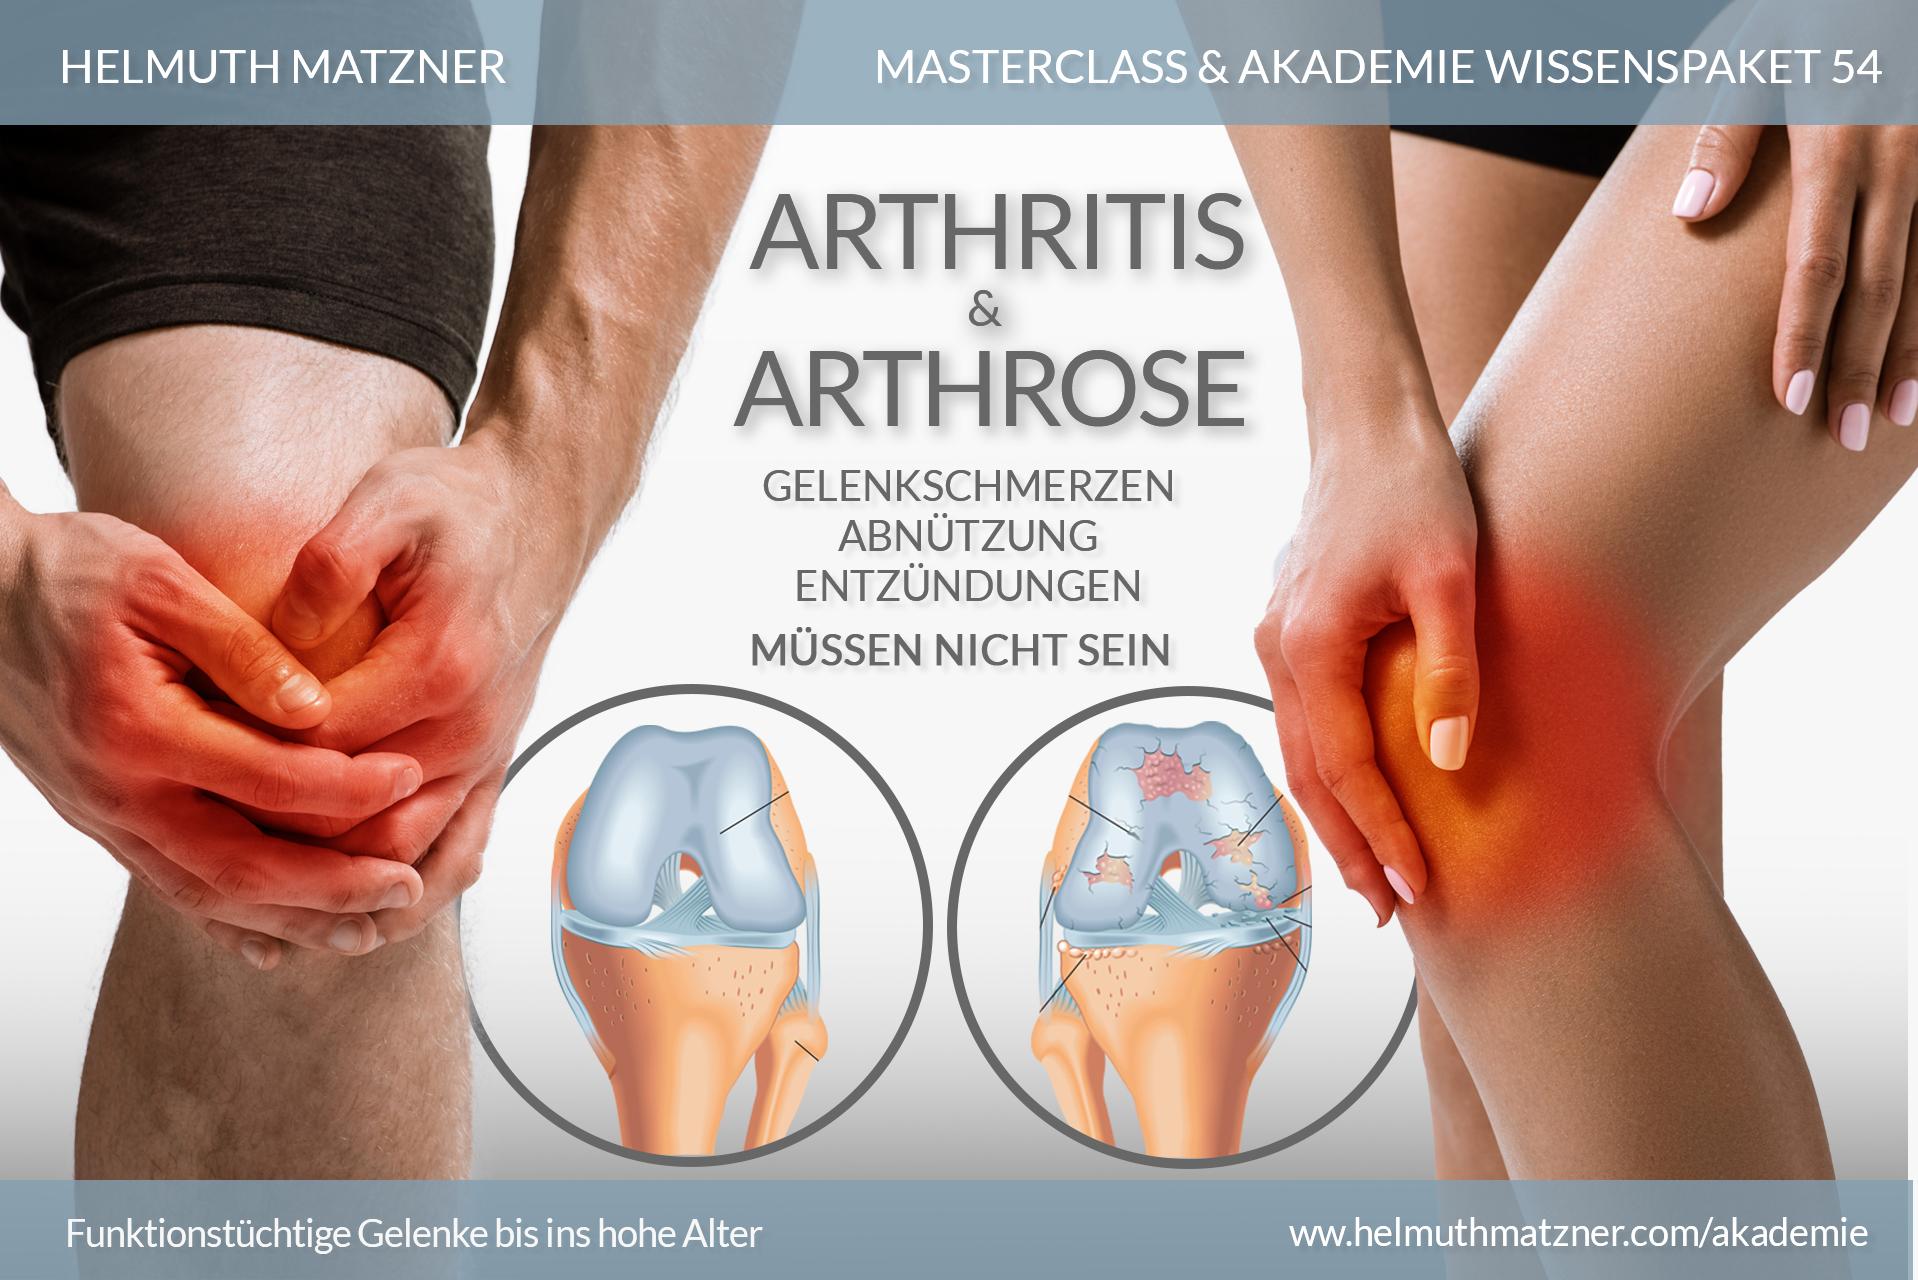 Helmuth Matzner - Masterclass & Akademie Wissenspaket 54 - Arthritis Arthrose - AKADEMIE - v01